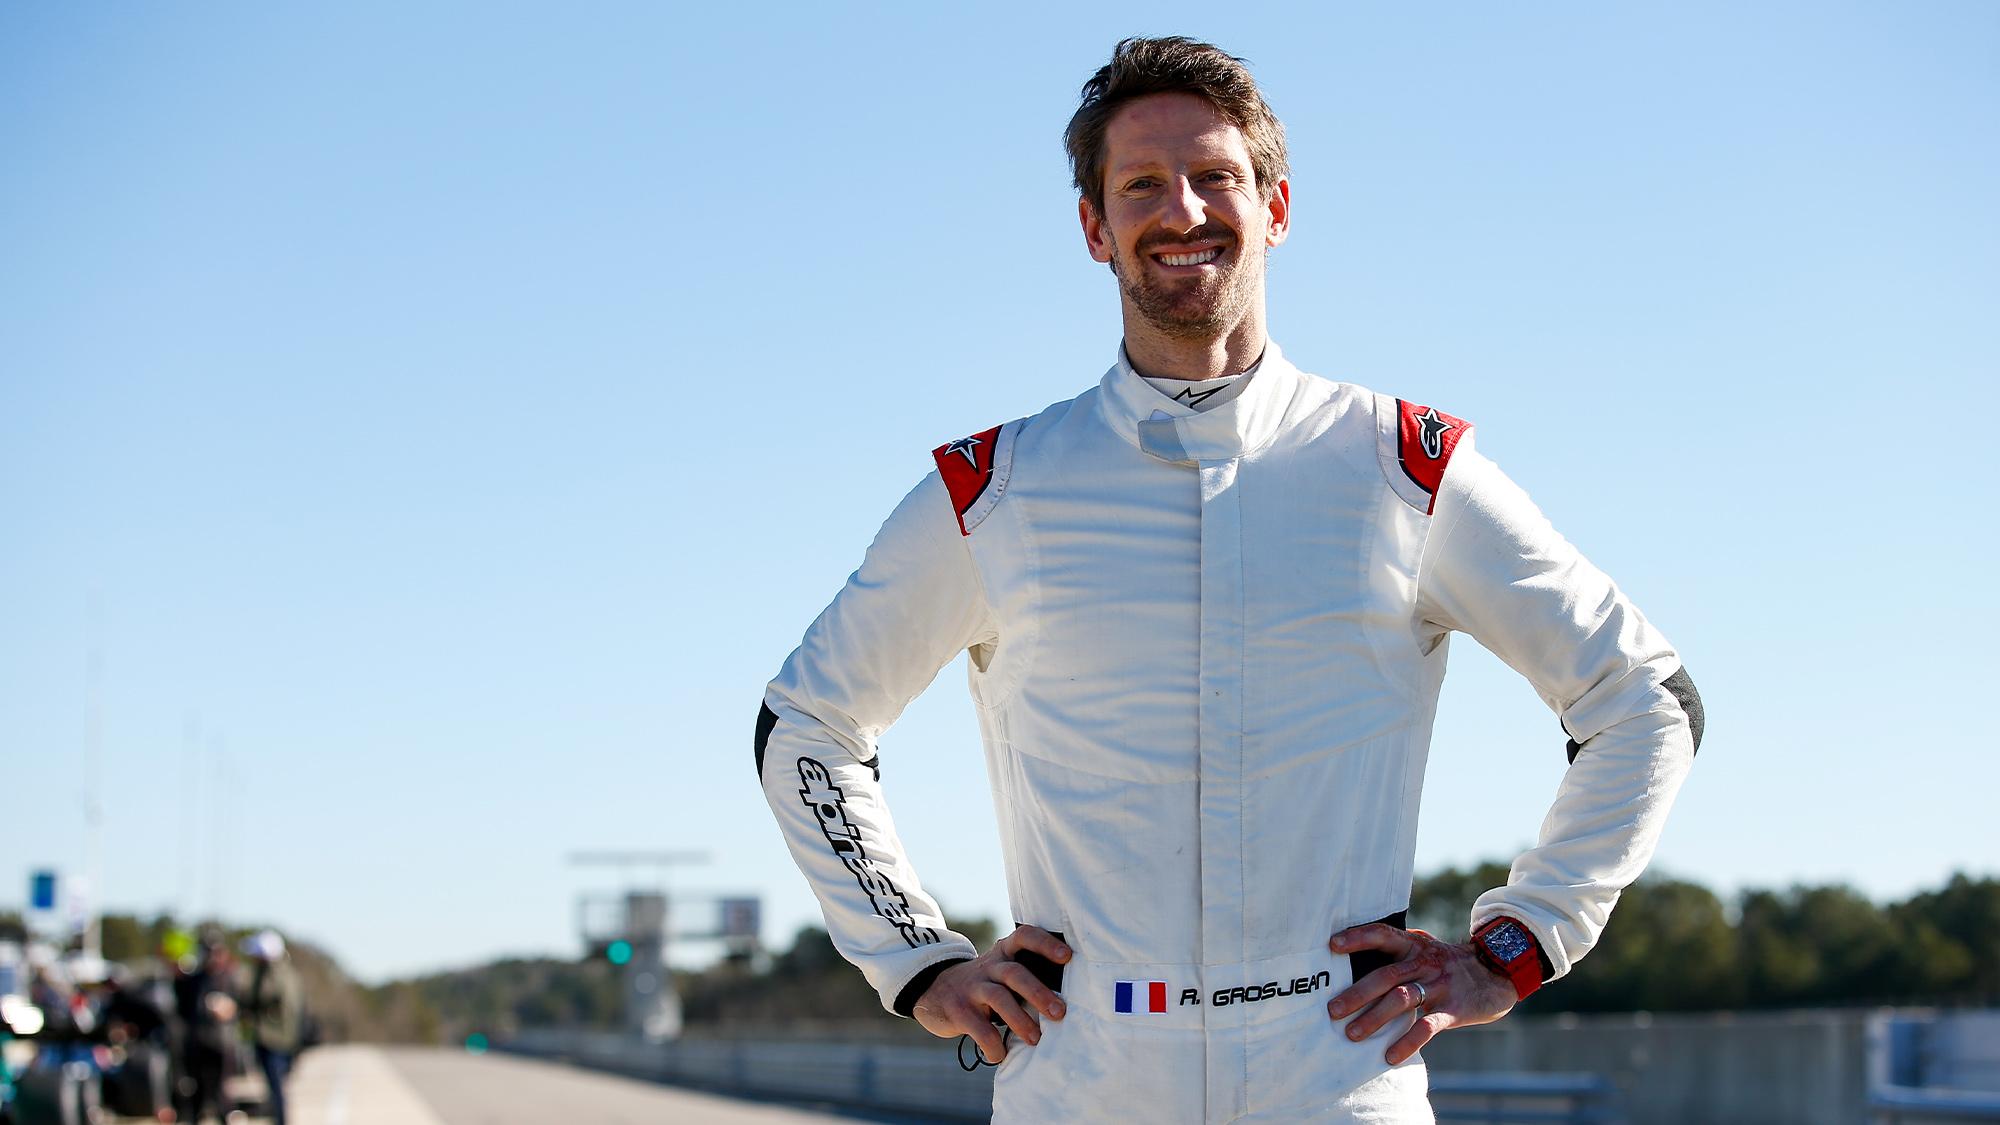 Romain Grosjean smiles during his 2021 Indycar test